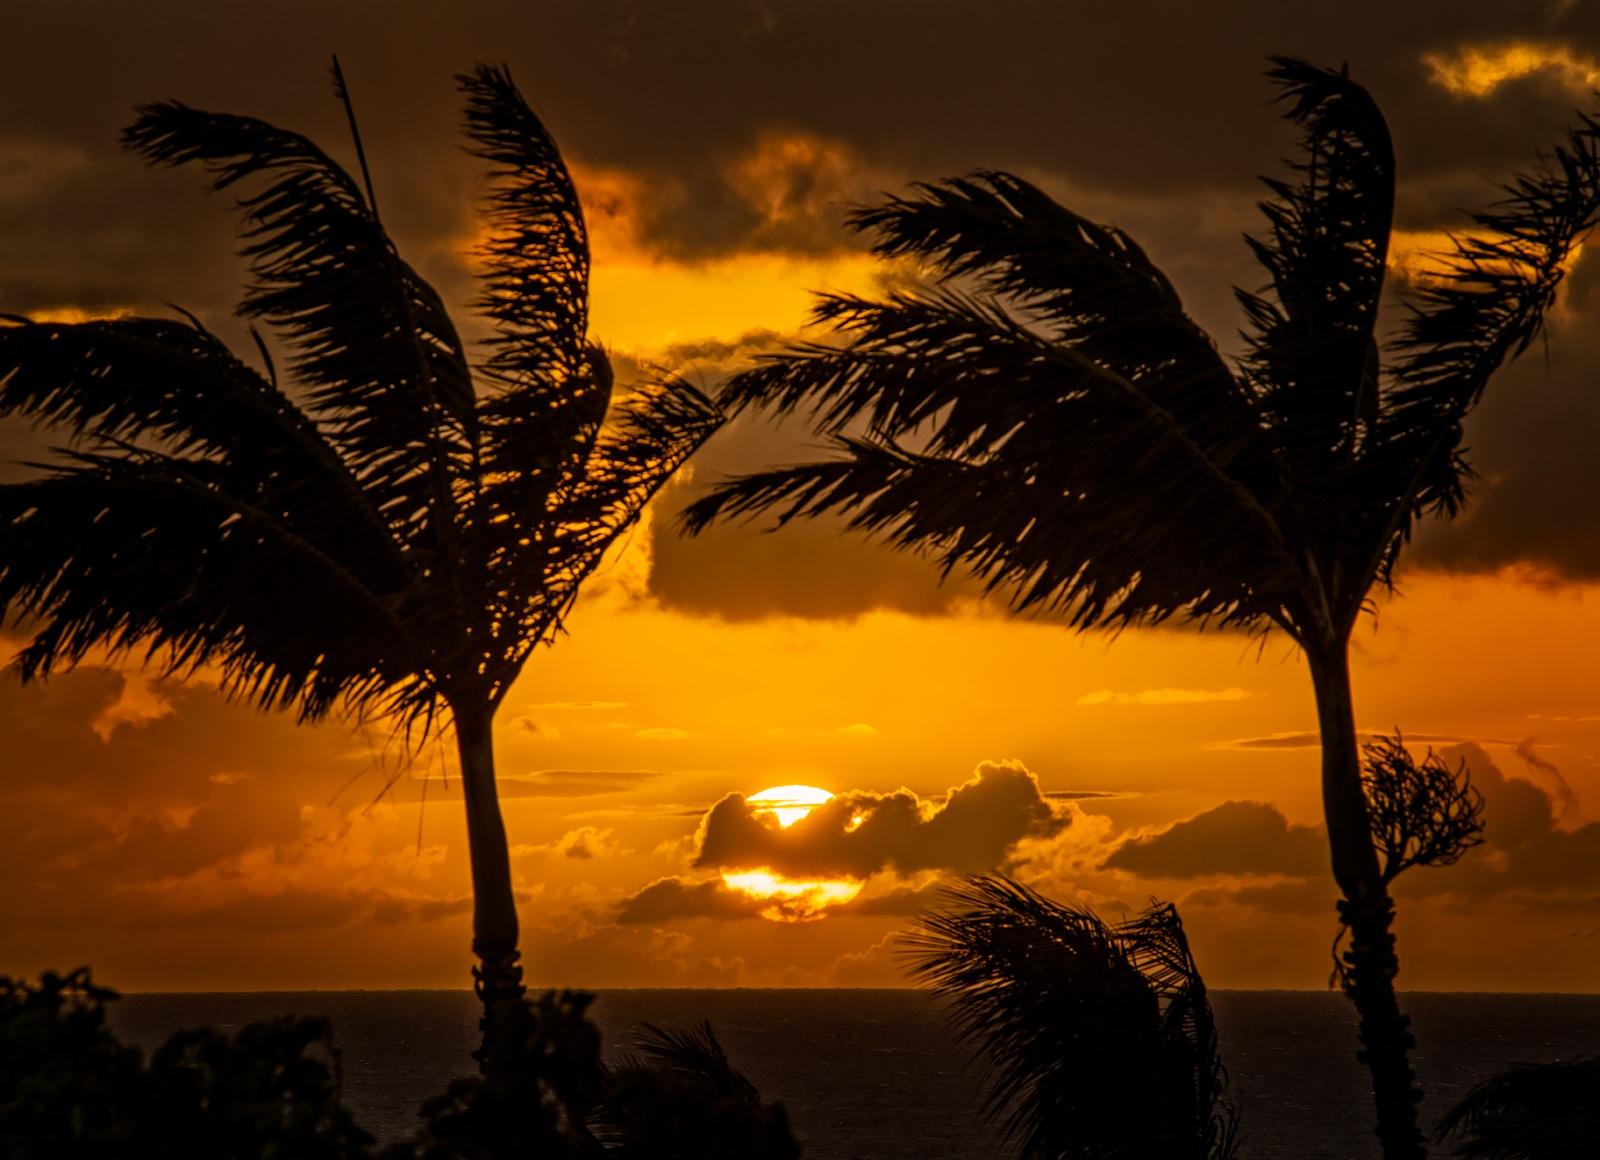 Maui Sunset by Philip Haber